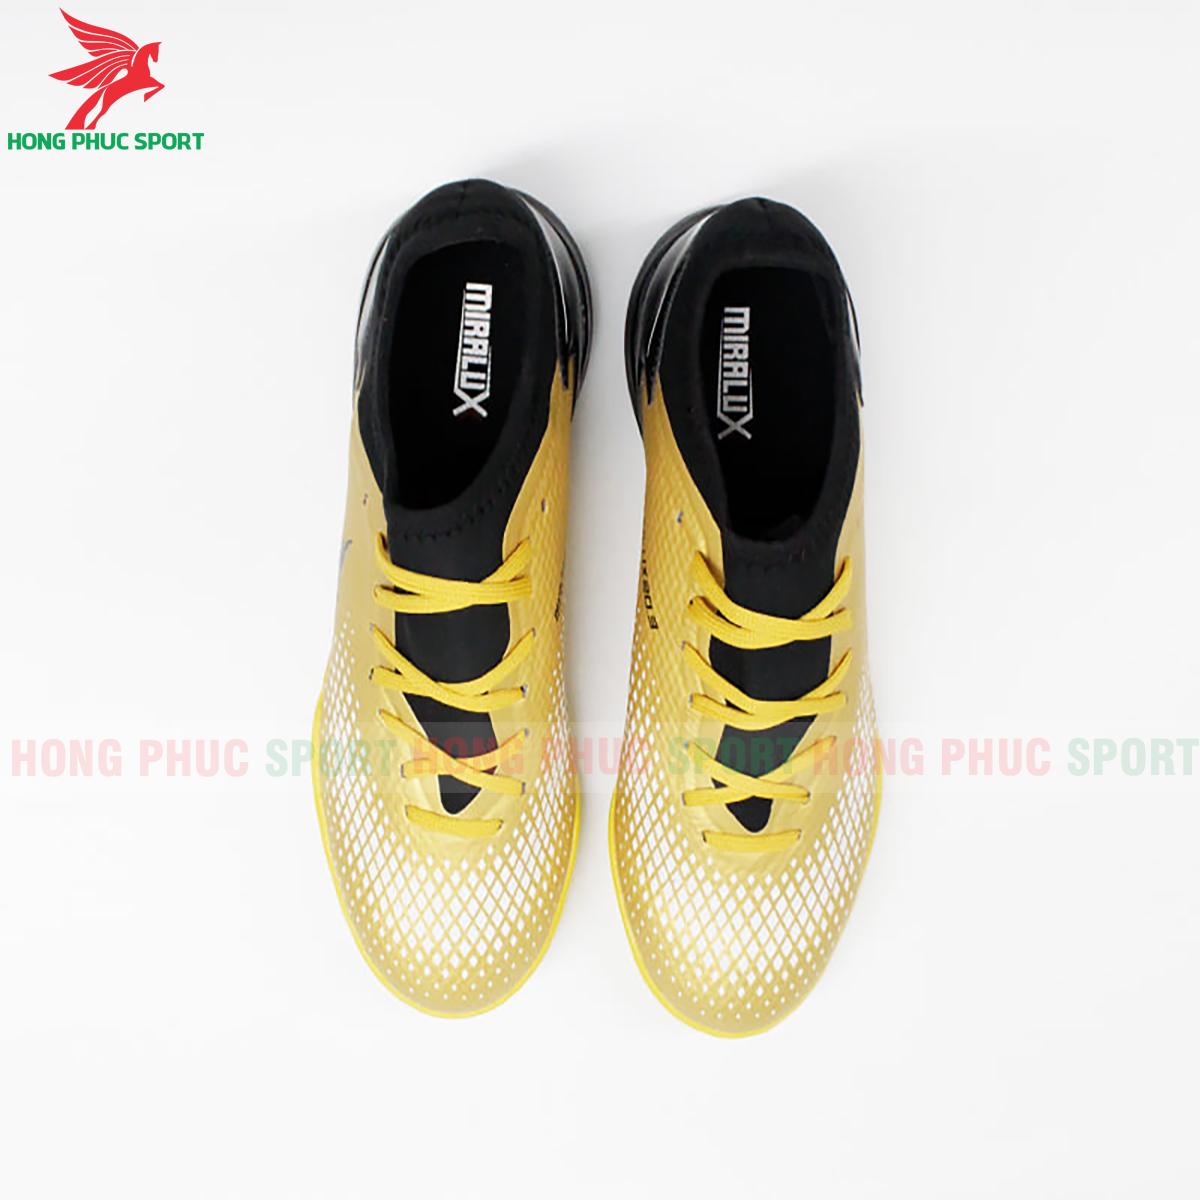 https://cdn.hongphucsport.com/unsafe/s4.shopbay.vn/files/285/giay-da-bong-mira-lux-20-3-mau-vang-phoi-den-2-5f74017ef12d3.png